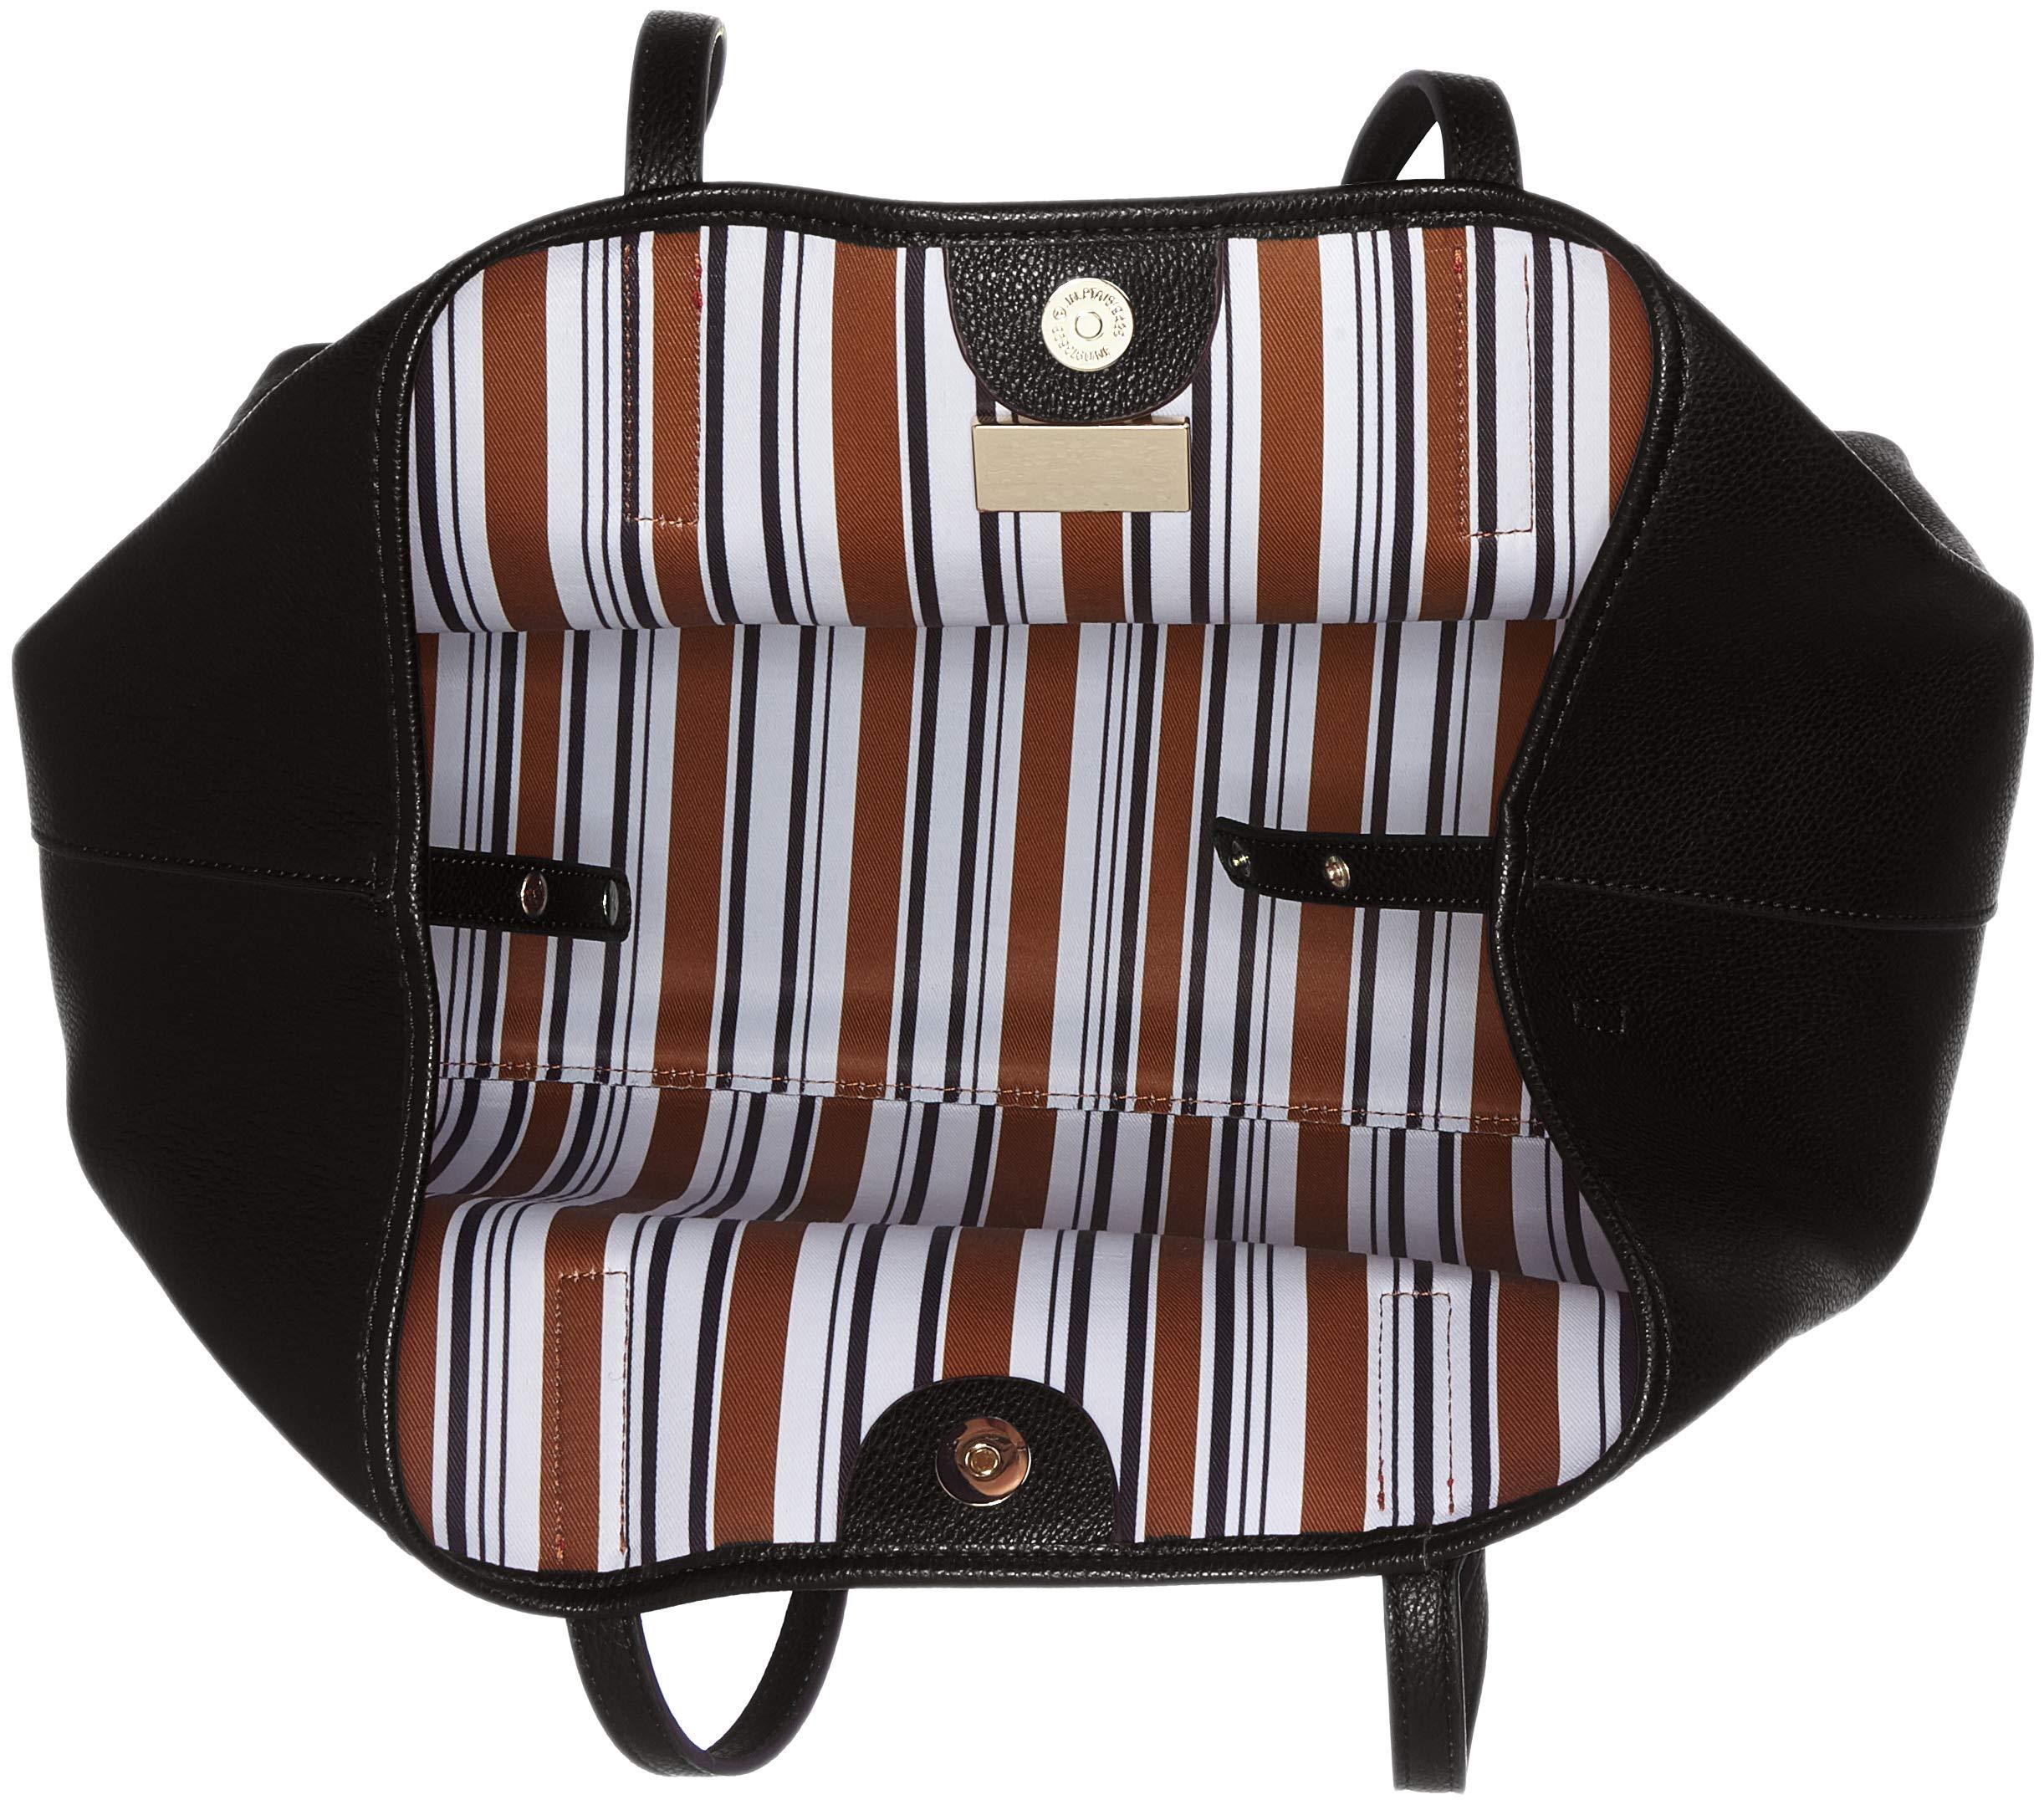 Donna Scarpe e borse 39.5x31x18 cm W x H x L Guess Vikky